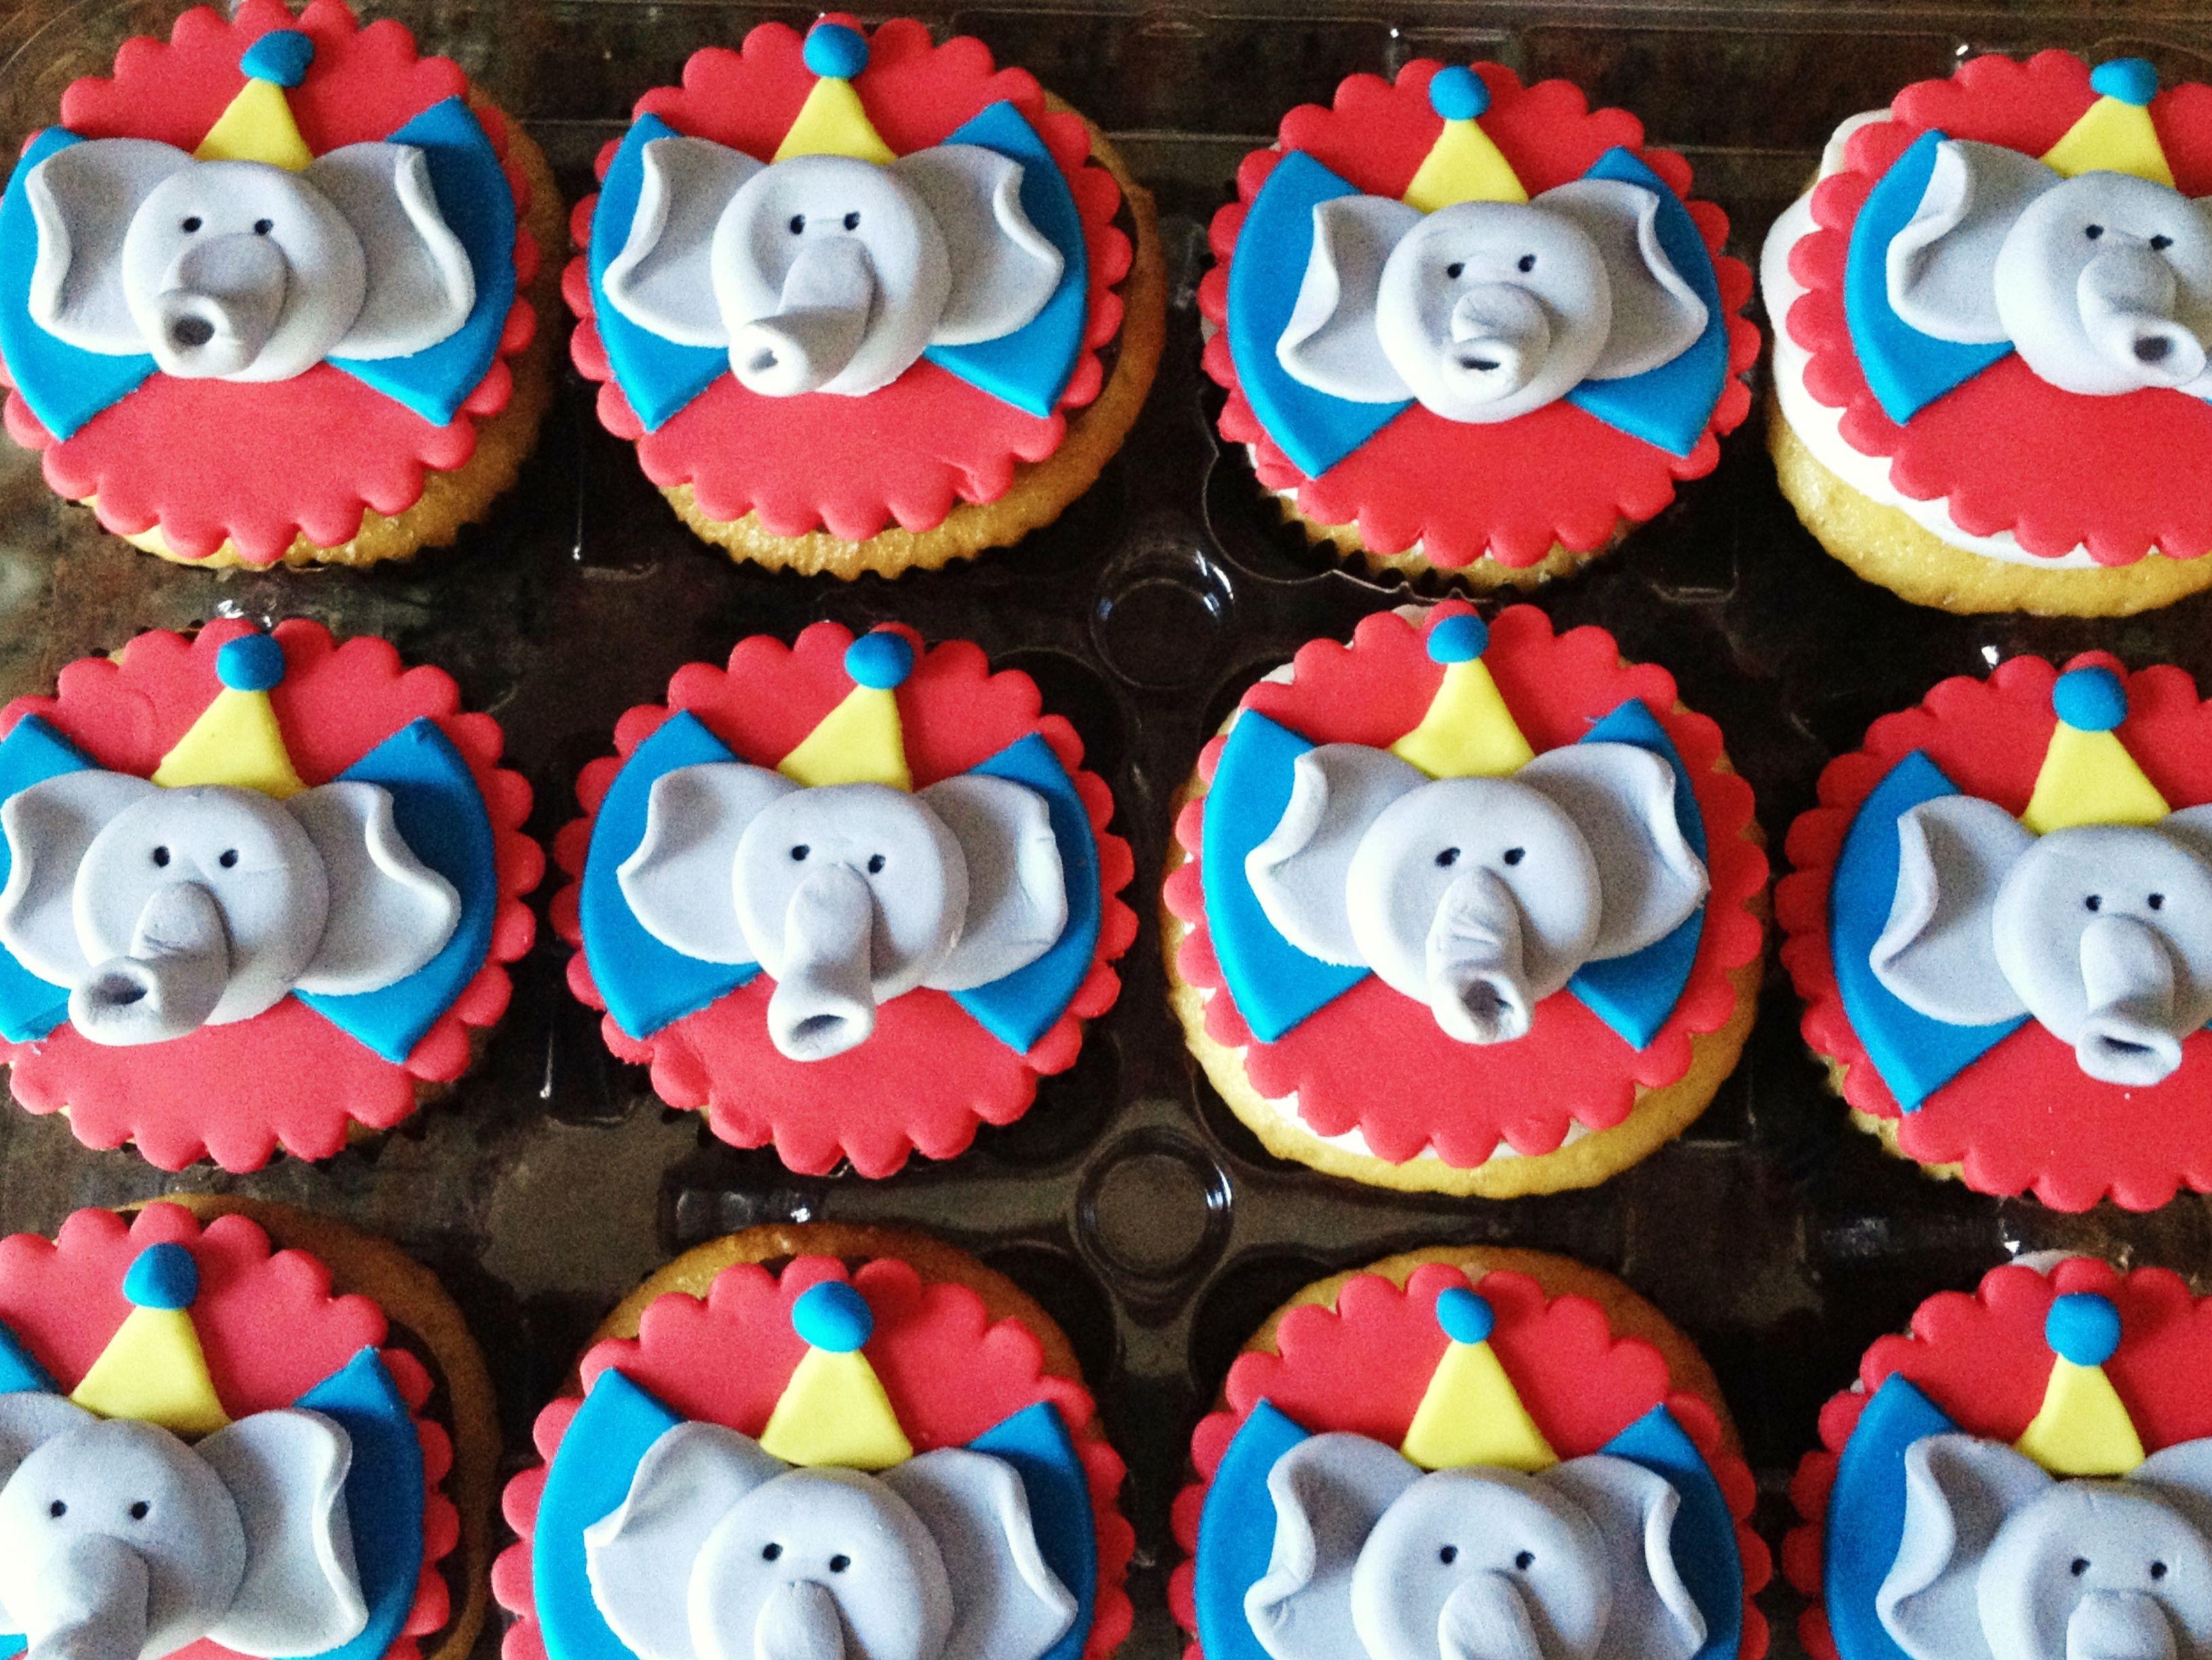 Circus cupcake toppers - elephants!  Http://www.heavenlybitescakes.com